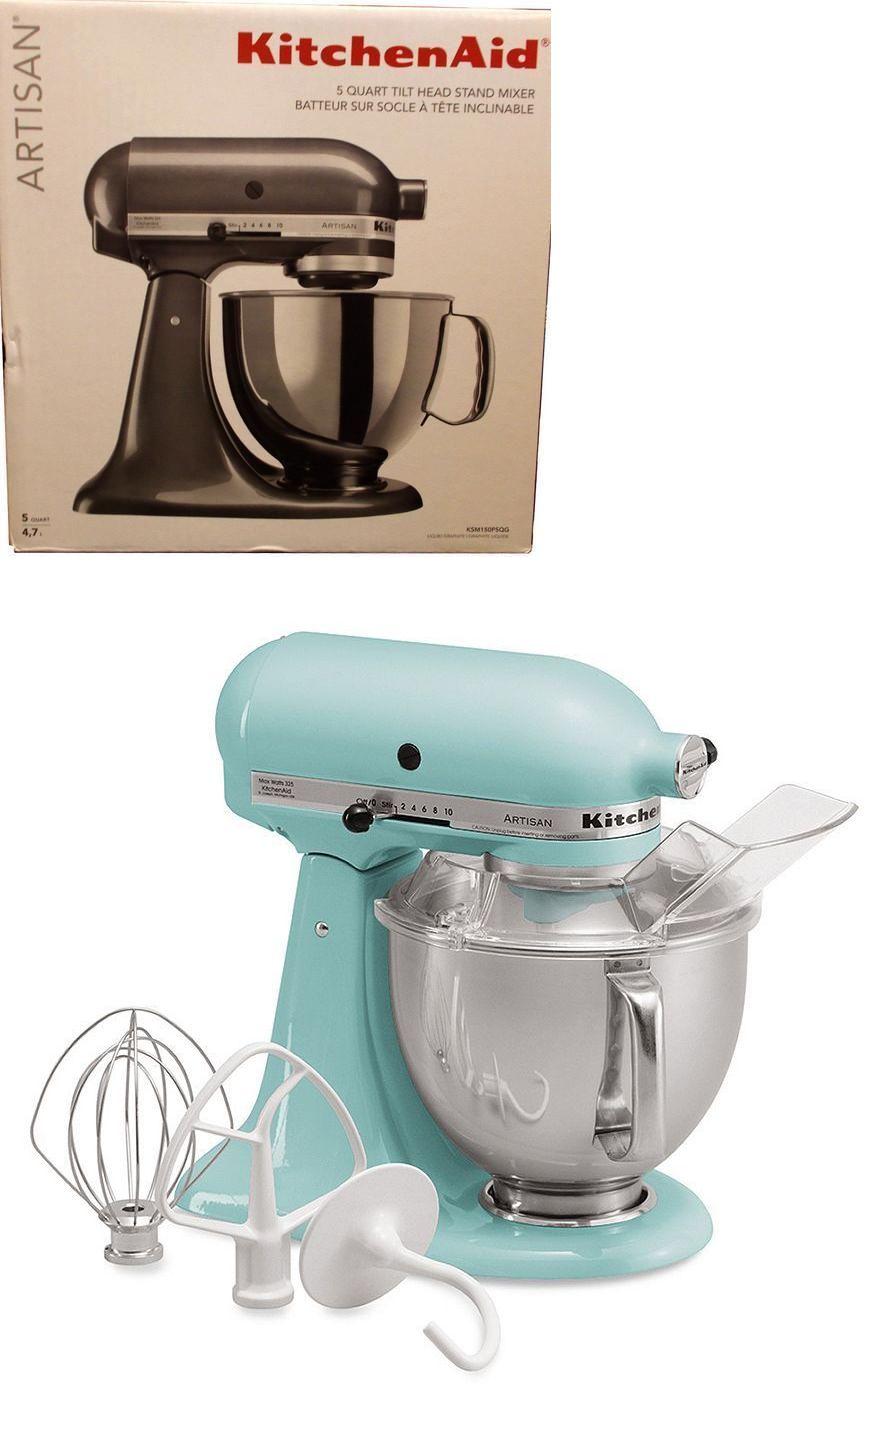 Uncategorized Where To Buy Small Kitchen Appliances small kitchen appliances kitchenaid ksm150ps artisan 5qt stand mixer aqua sky brand new